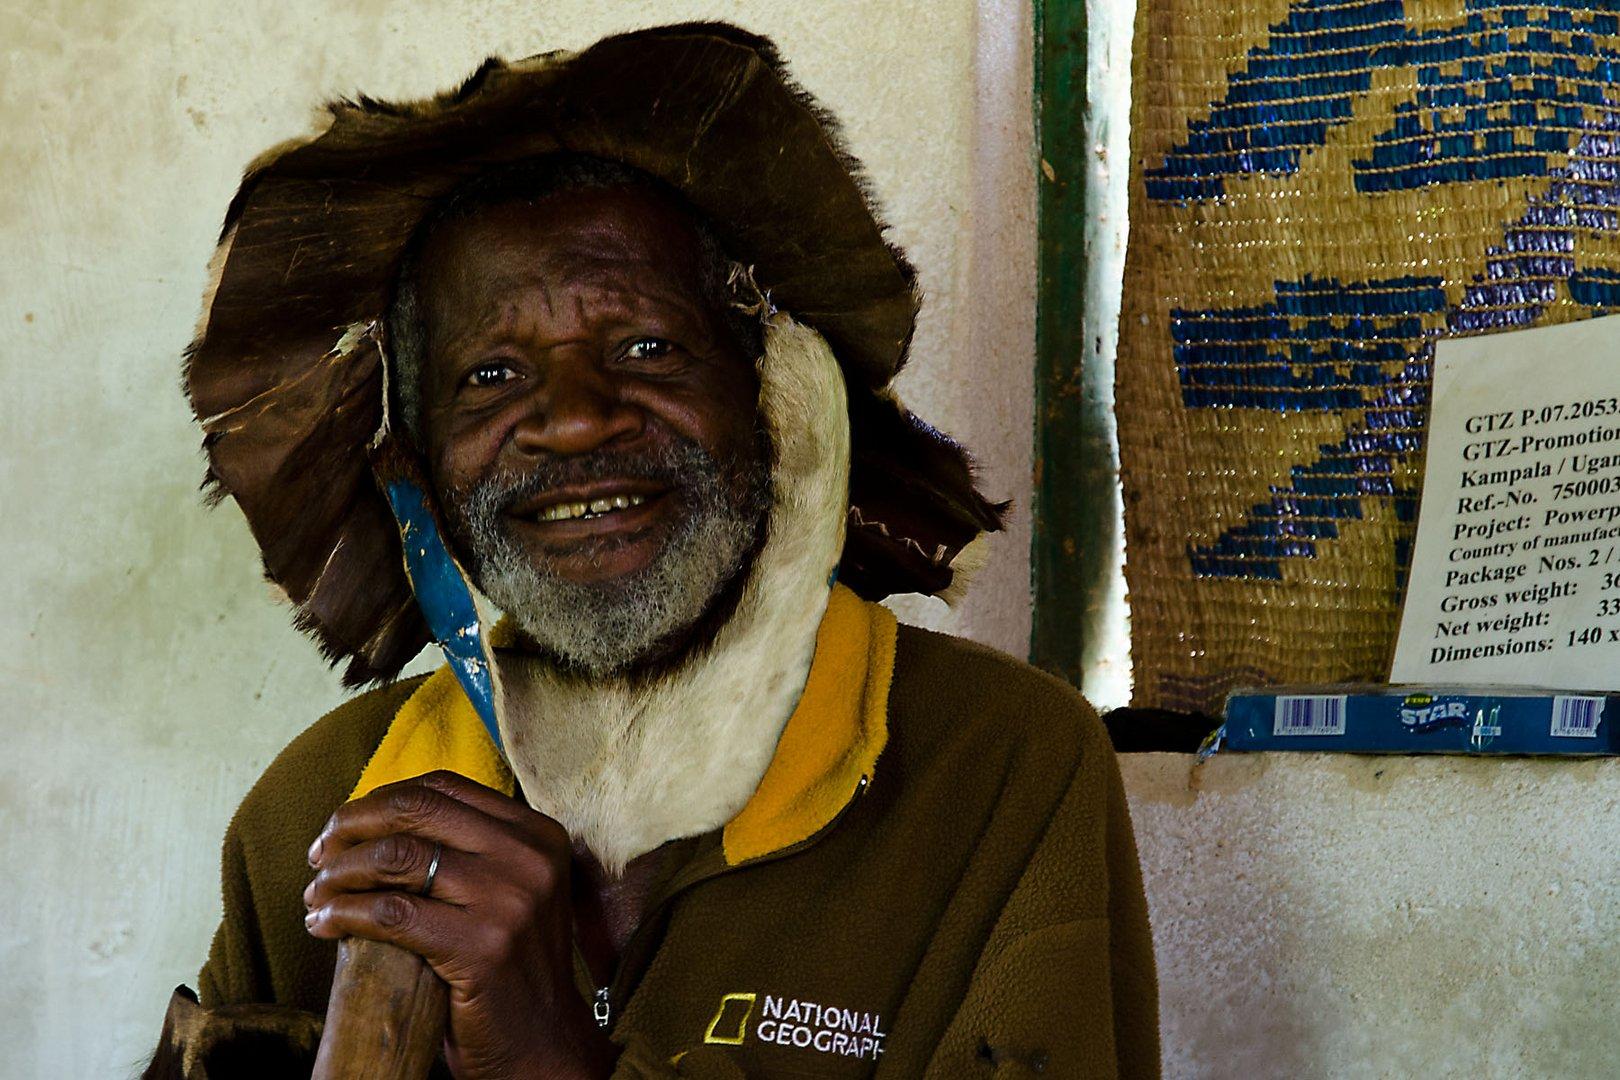 Afrikanischer Medizinmann